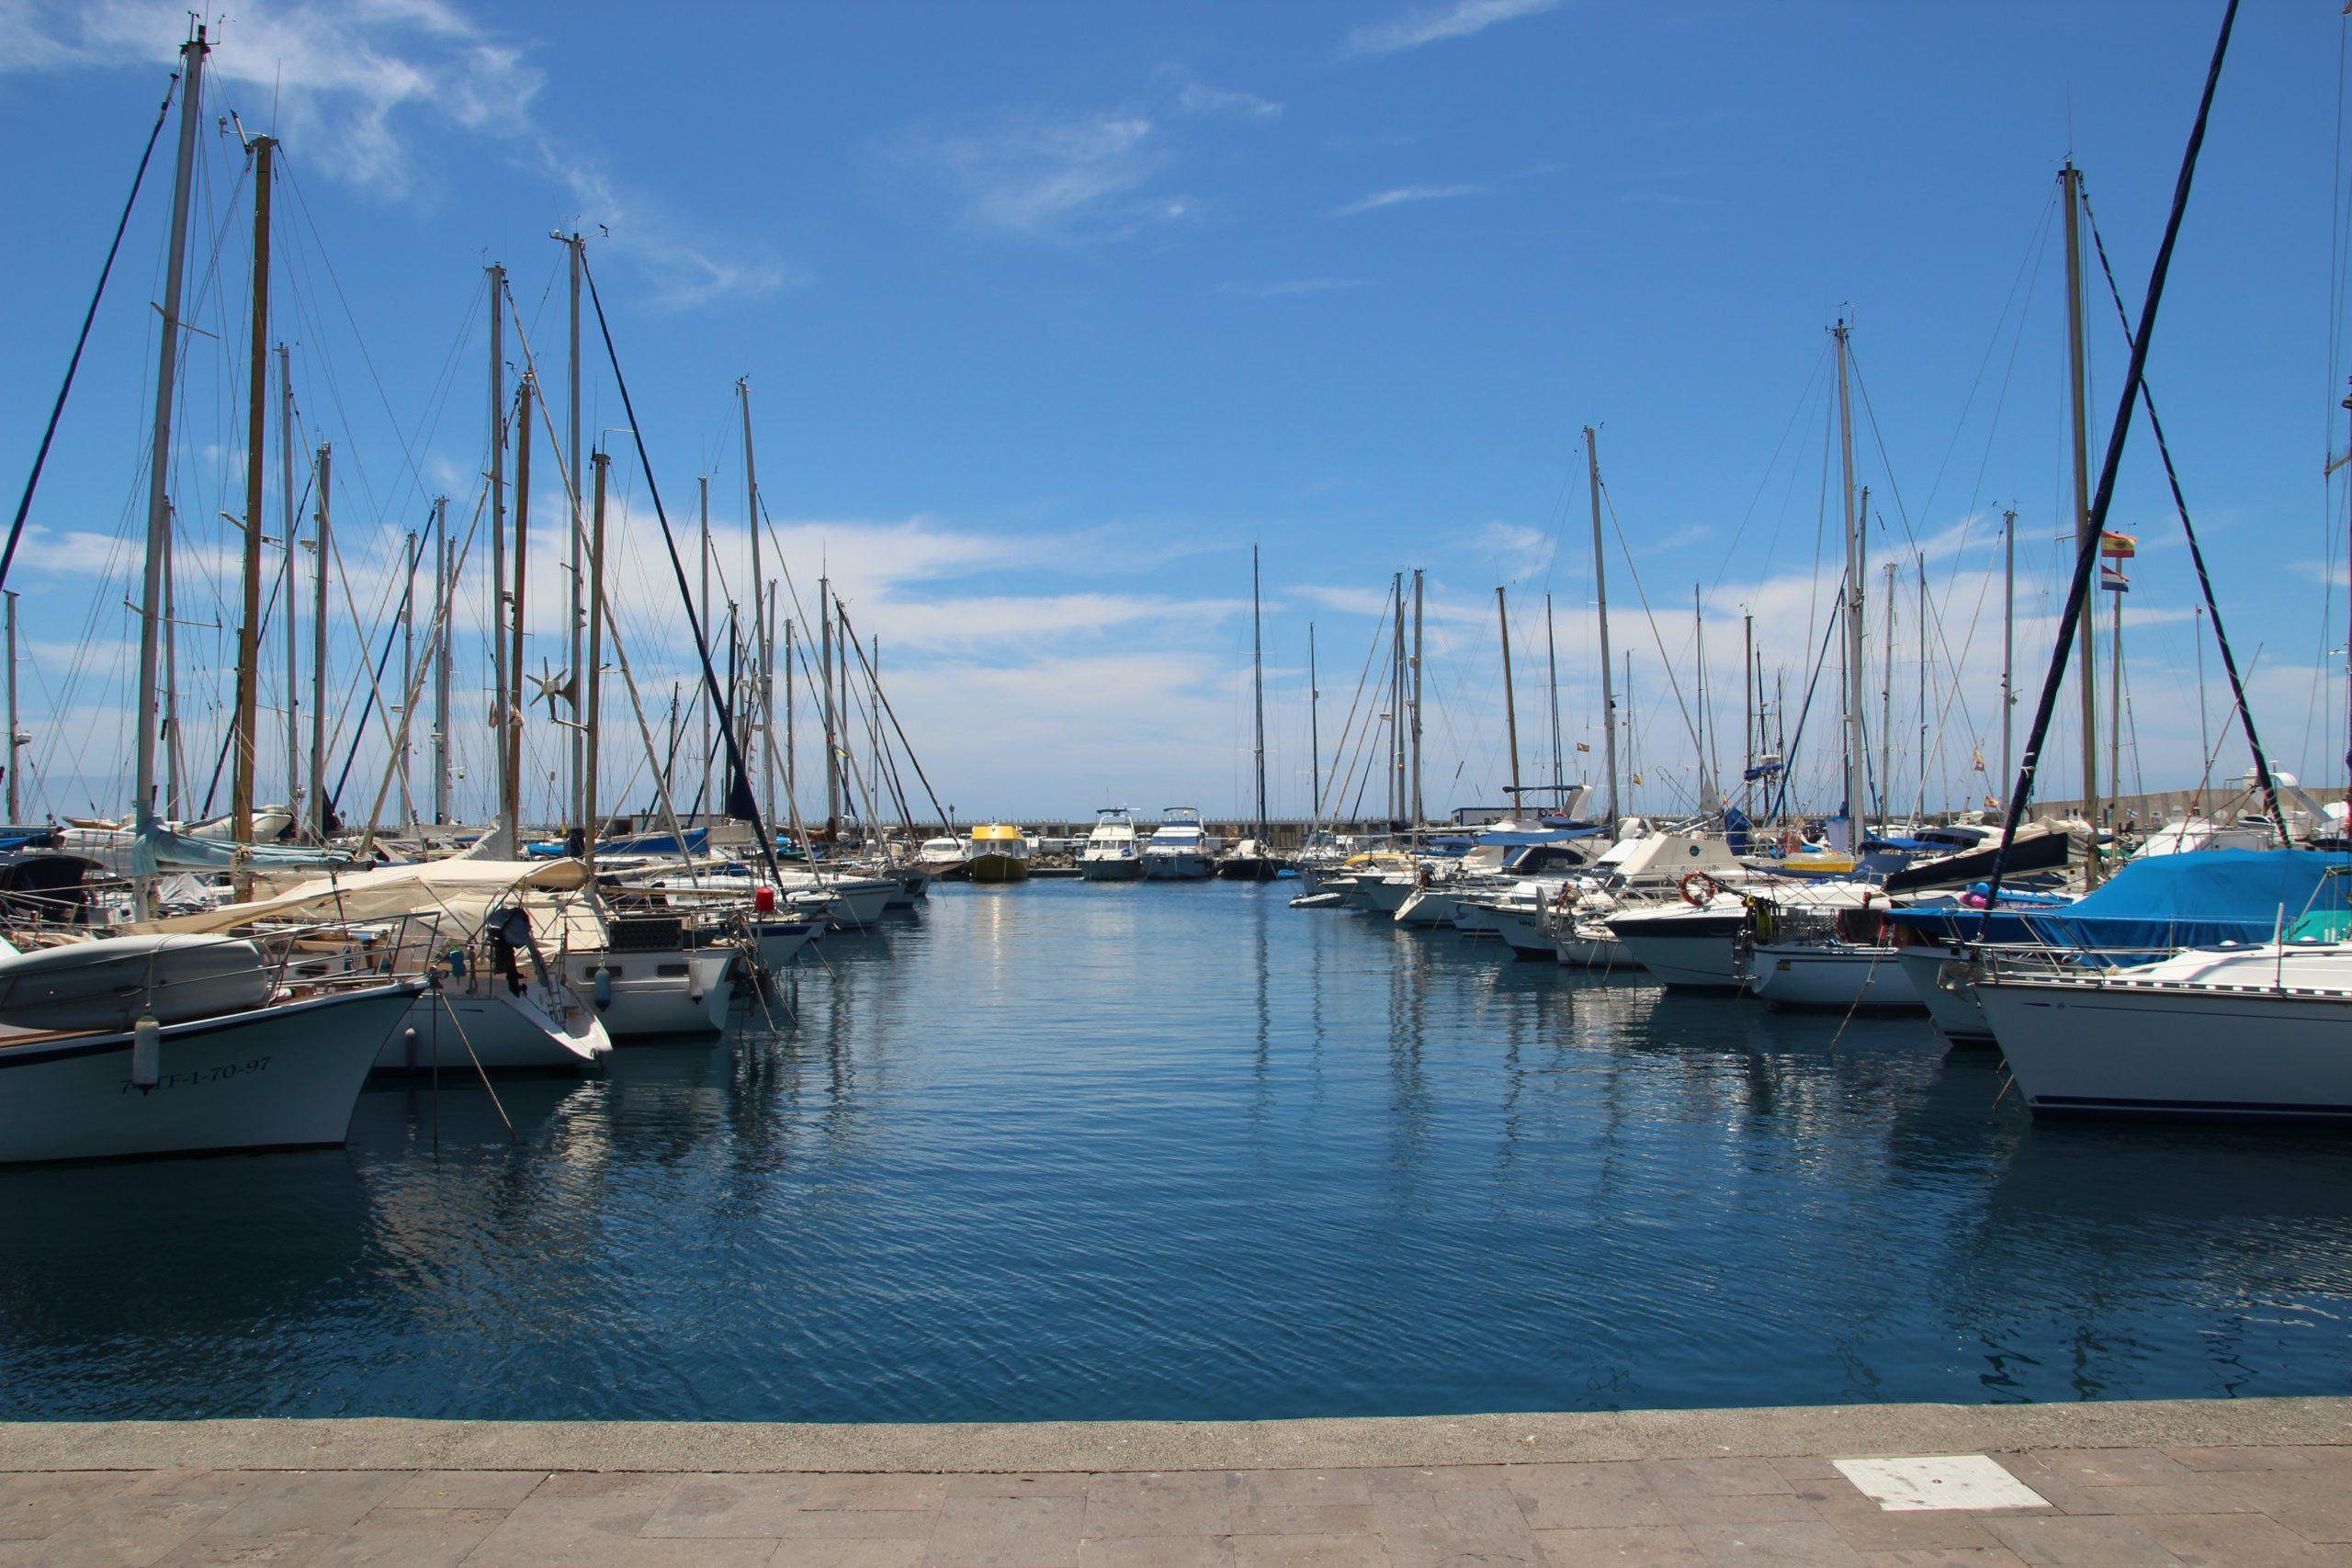 puerto barcos denia experience